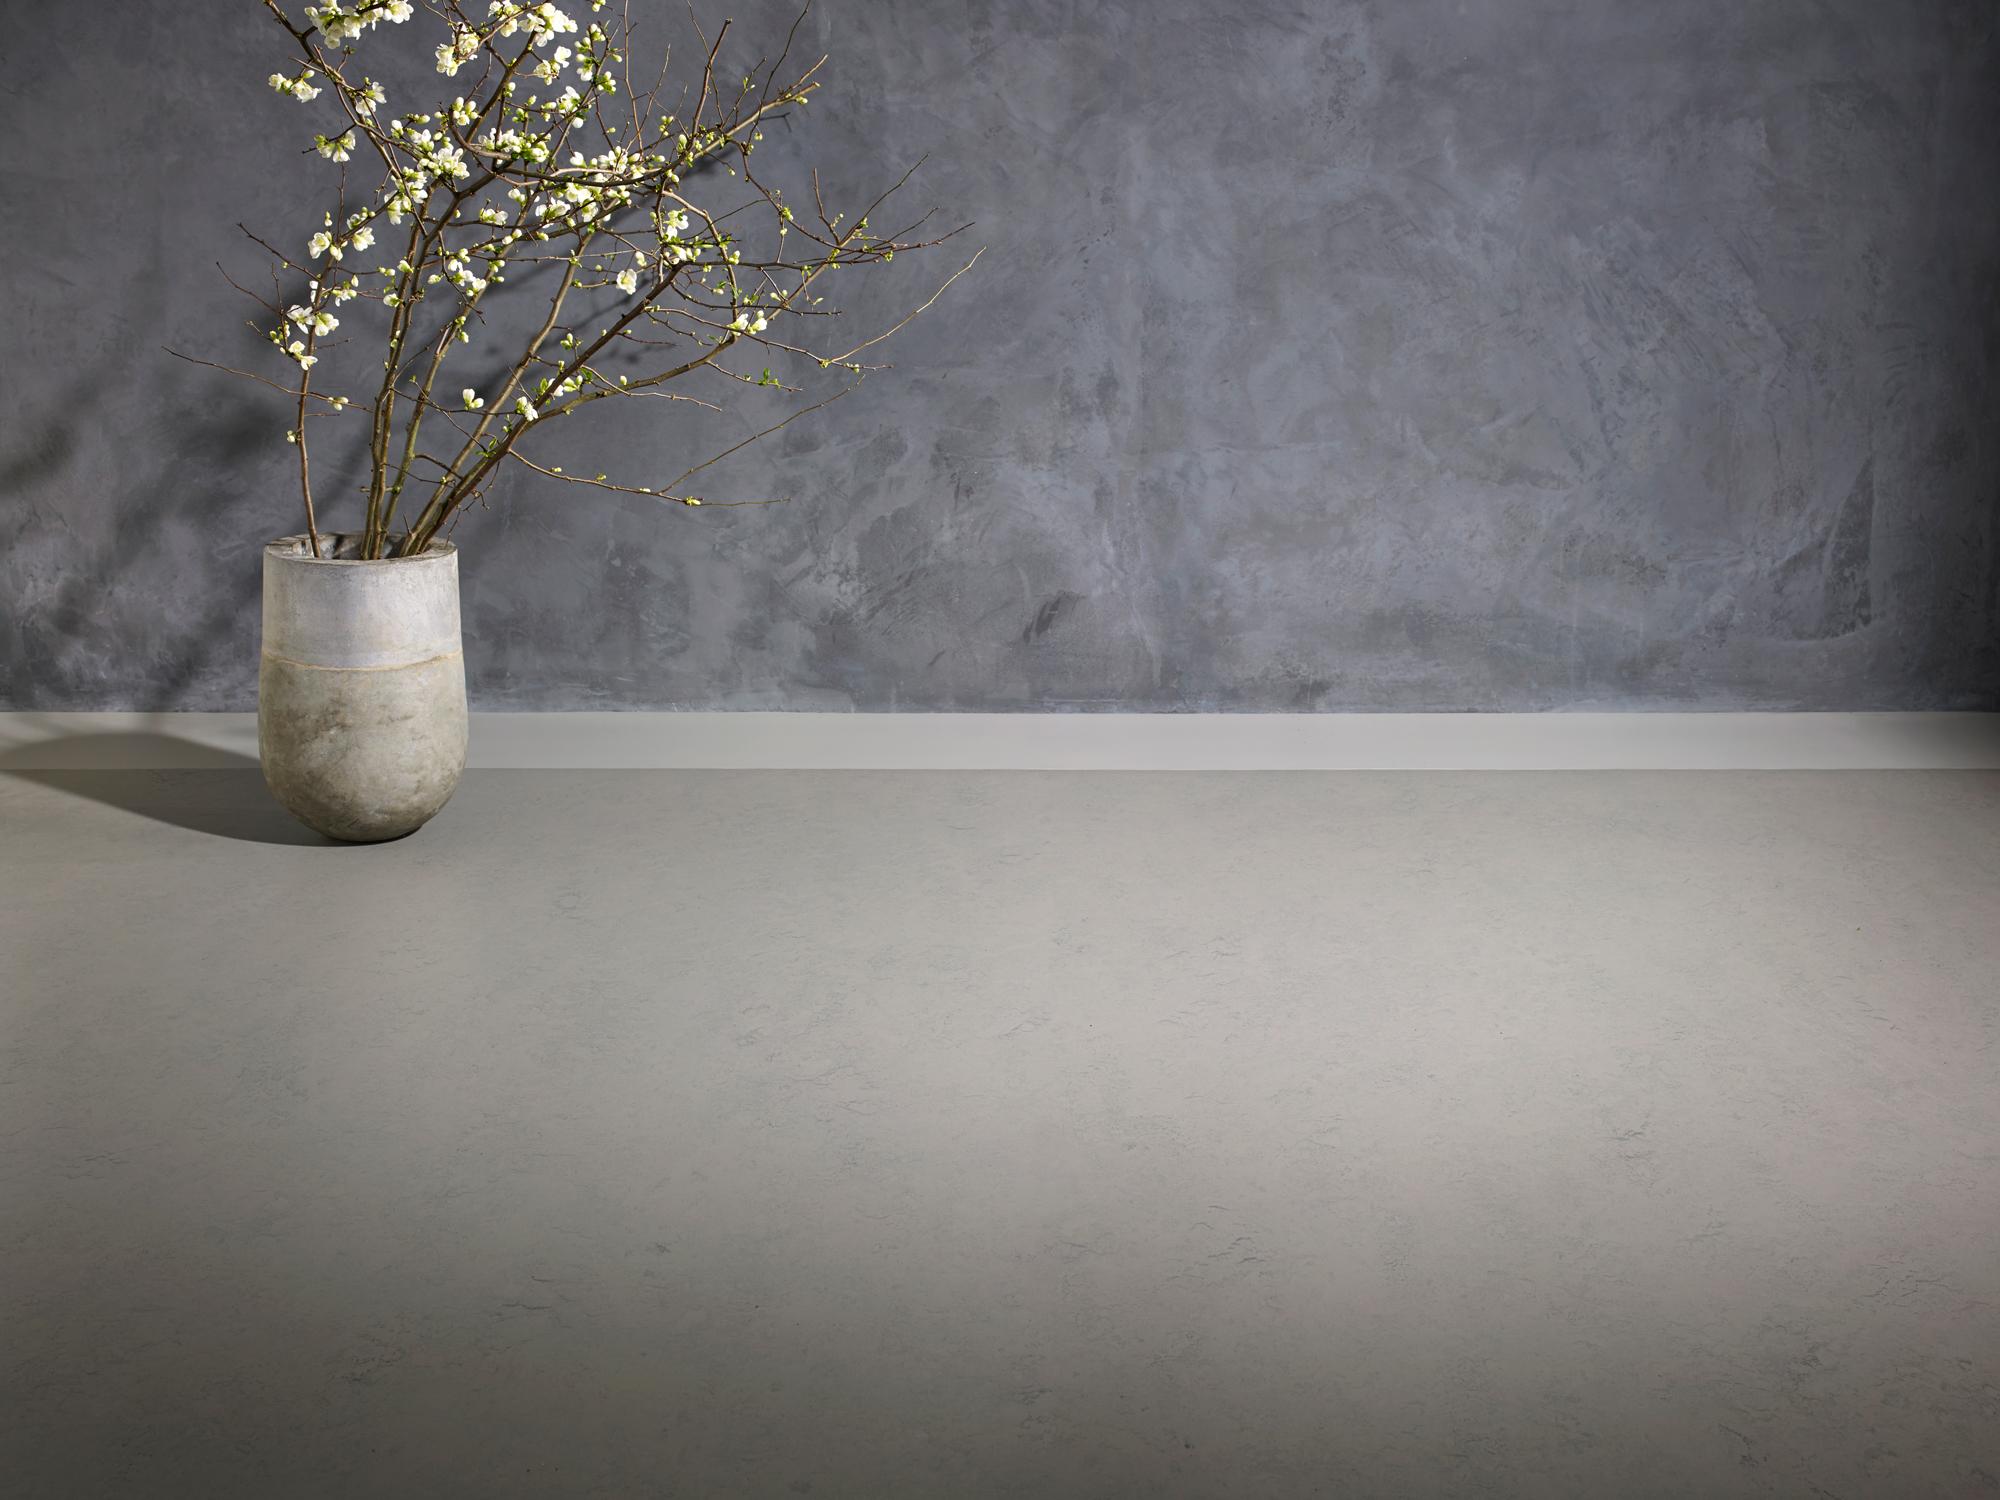 Wat Is Marmoleum : Marmoleum vloer bien connue woninginrichting vught